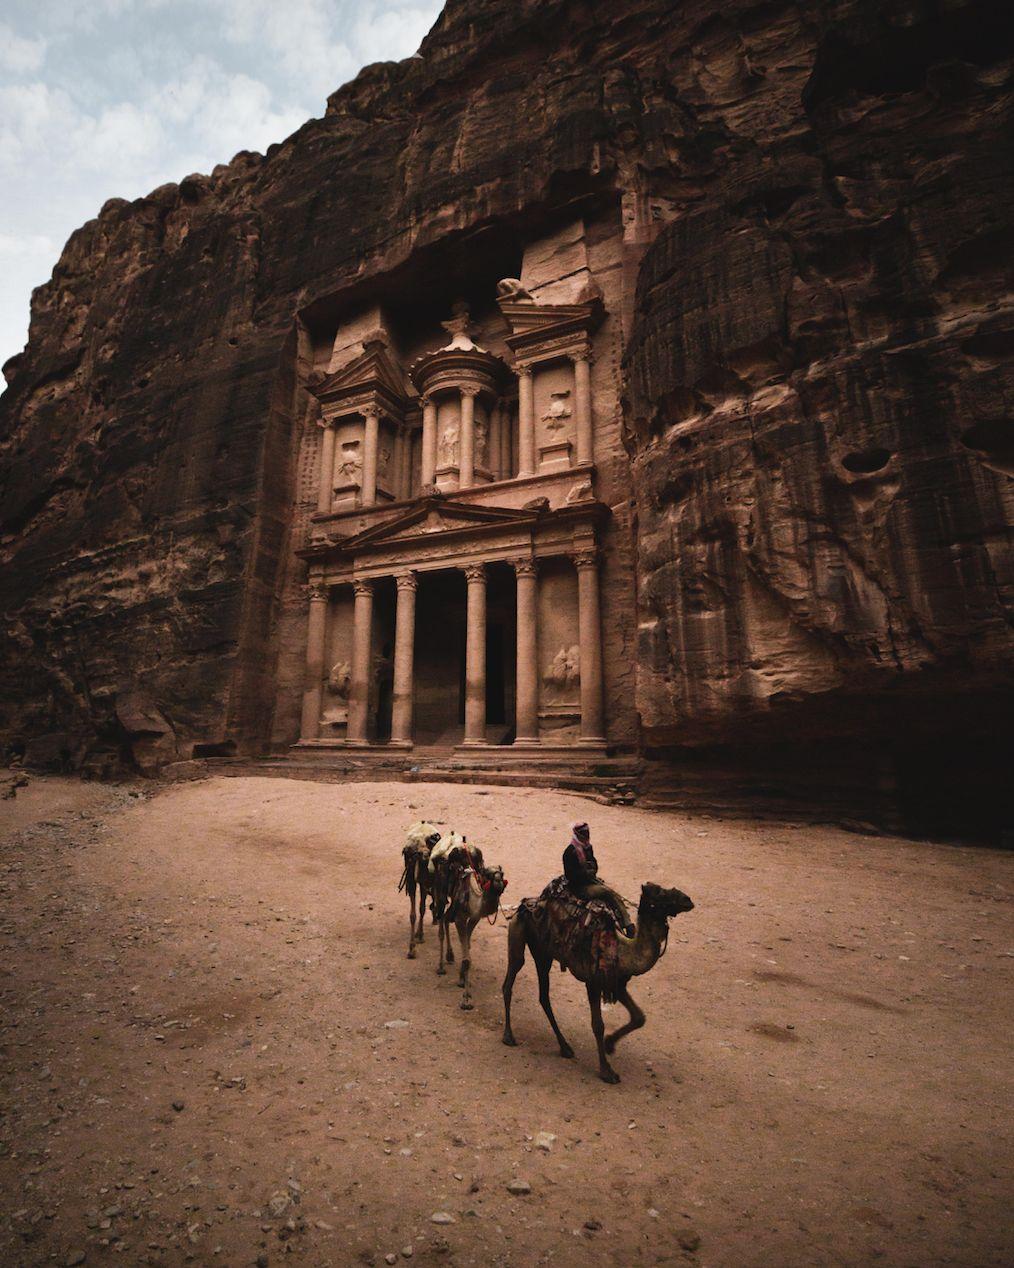 Roaming on Camel Back